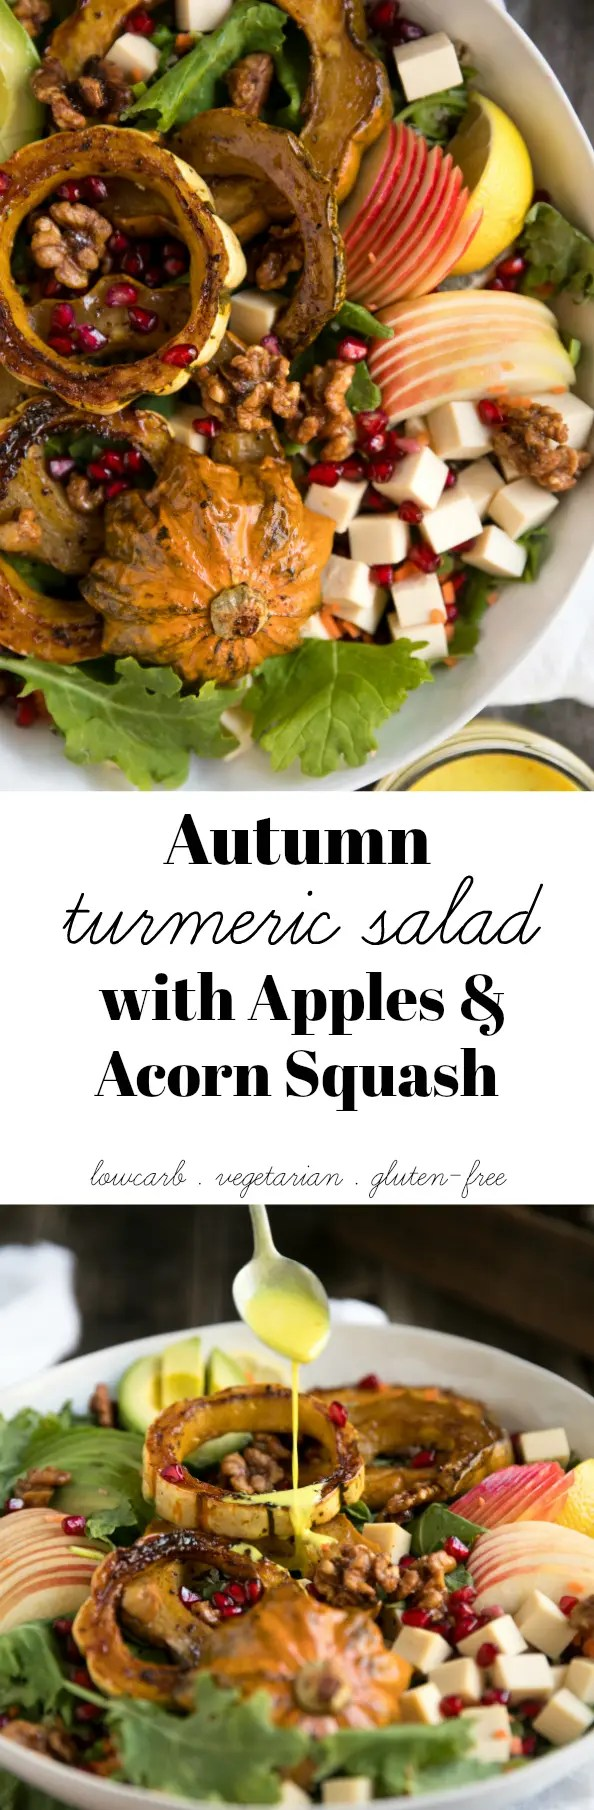 Autumn Turmeric Salad with Apples and Acorn Squash #salad #turmeric #squash #goudacheese #healthy #vegetarian #apples #dinner via @theforkedspoon